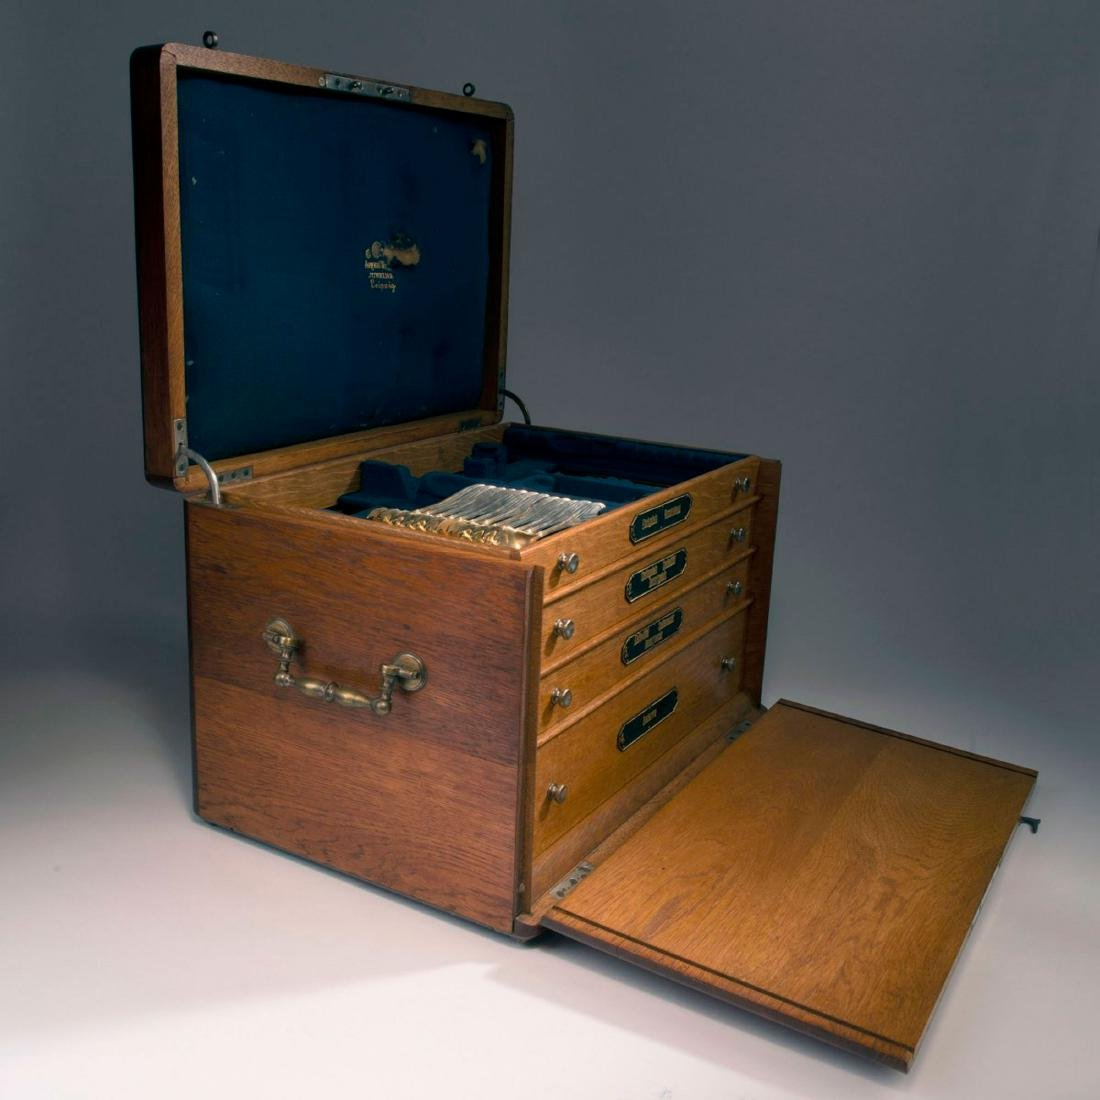 '3001' cutlery in original wooden box, 1901/02 - 5